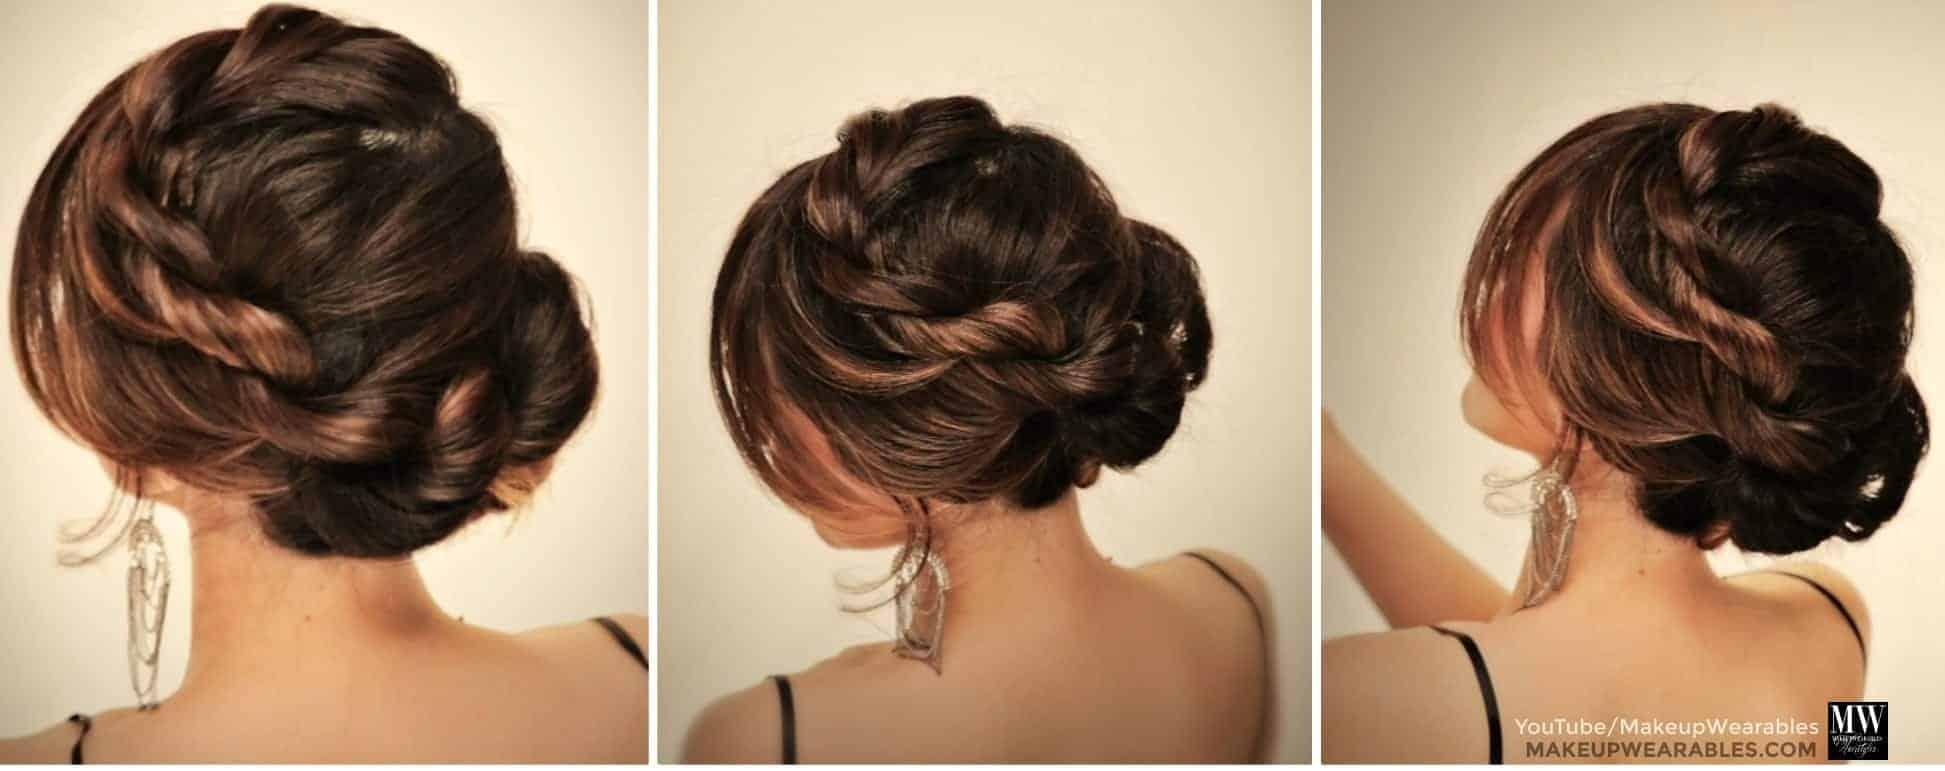 Easy Bun Hairstyles For Long Thick Hair Hrotelrehberii